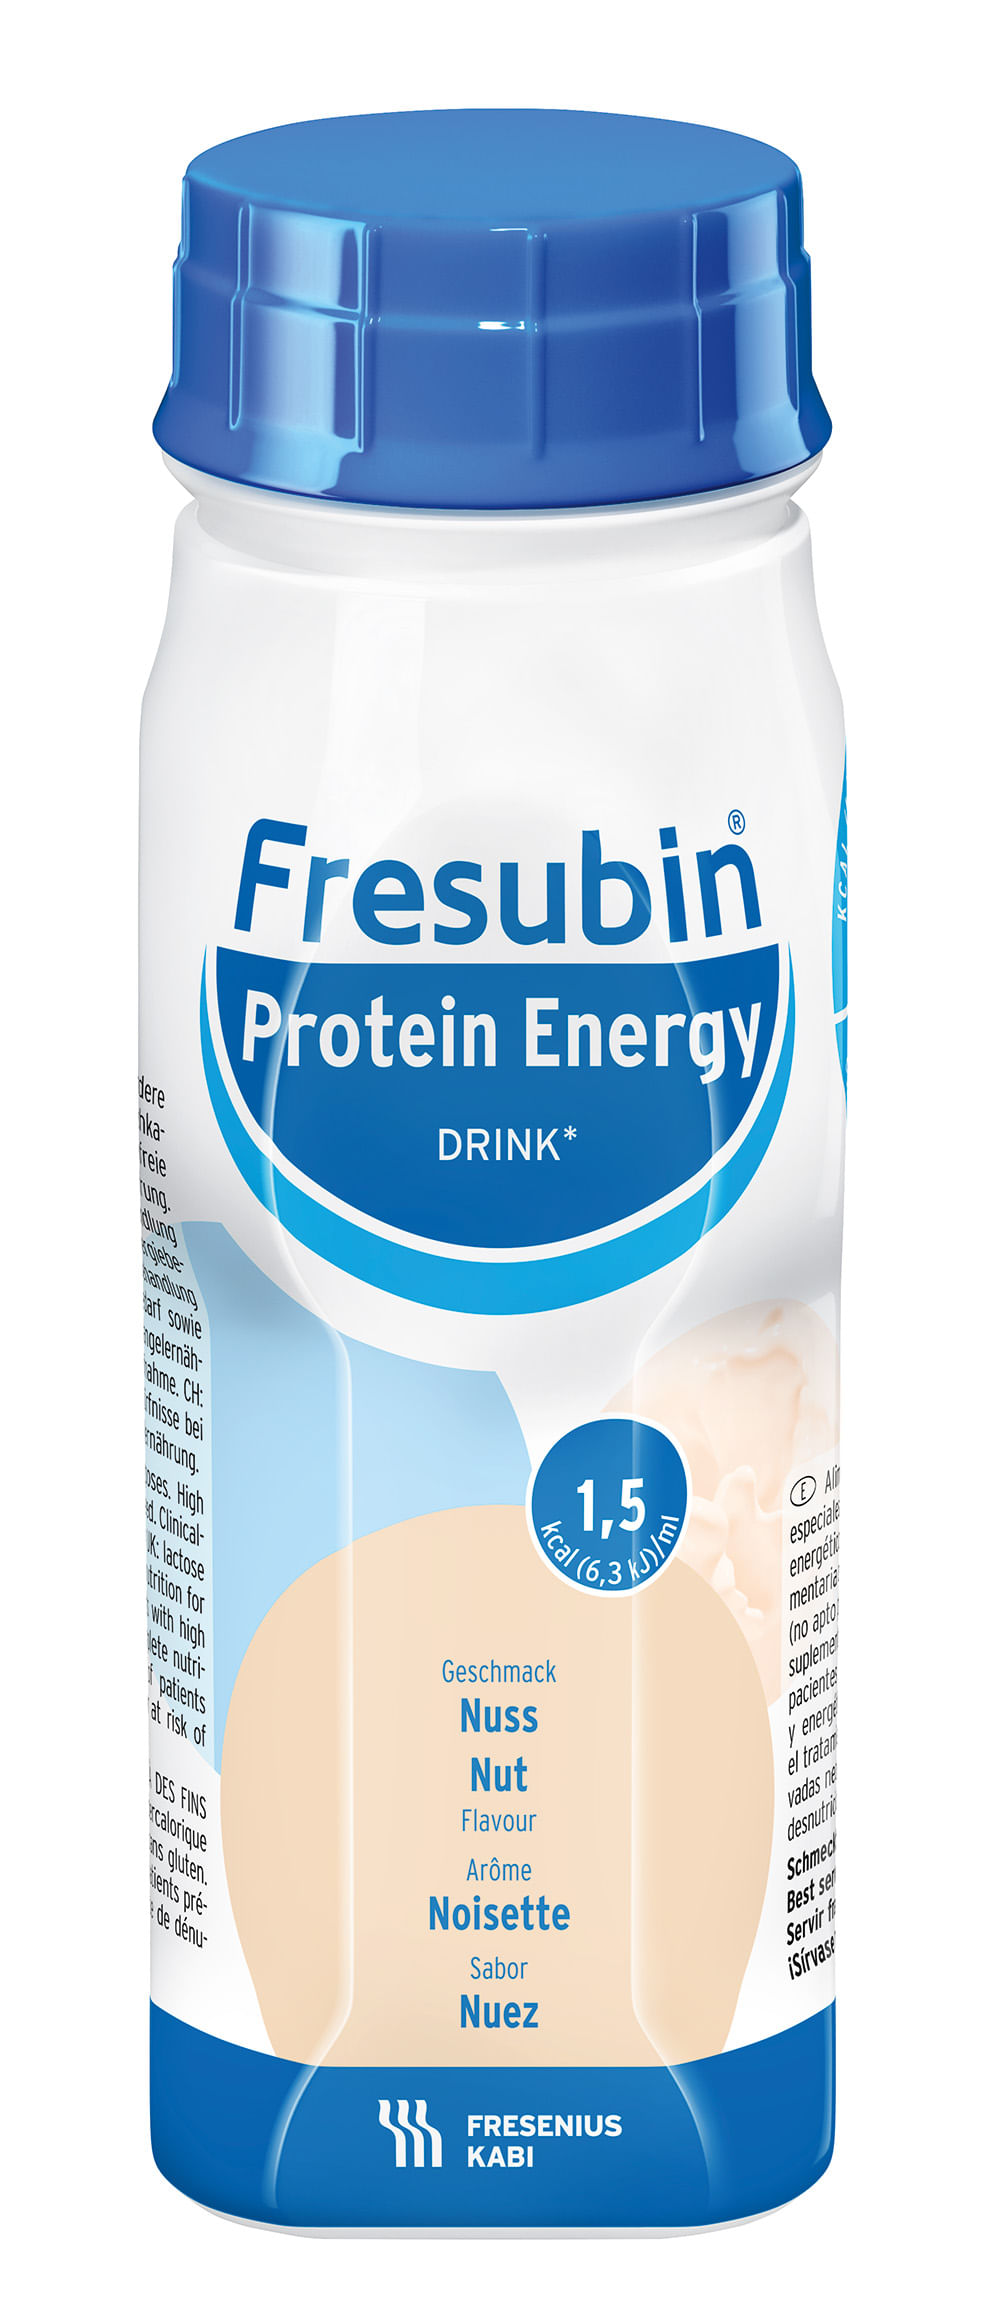 Fresubin_Protein_Energy_Nut_EBo_Frontal